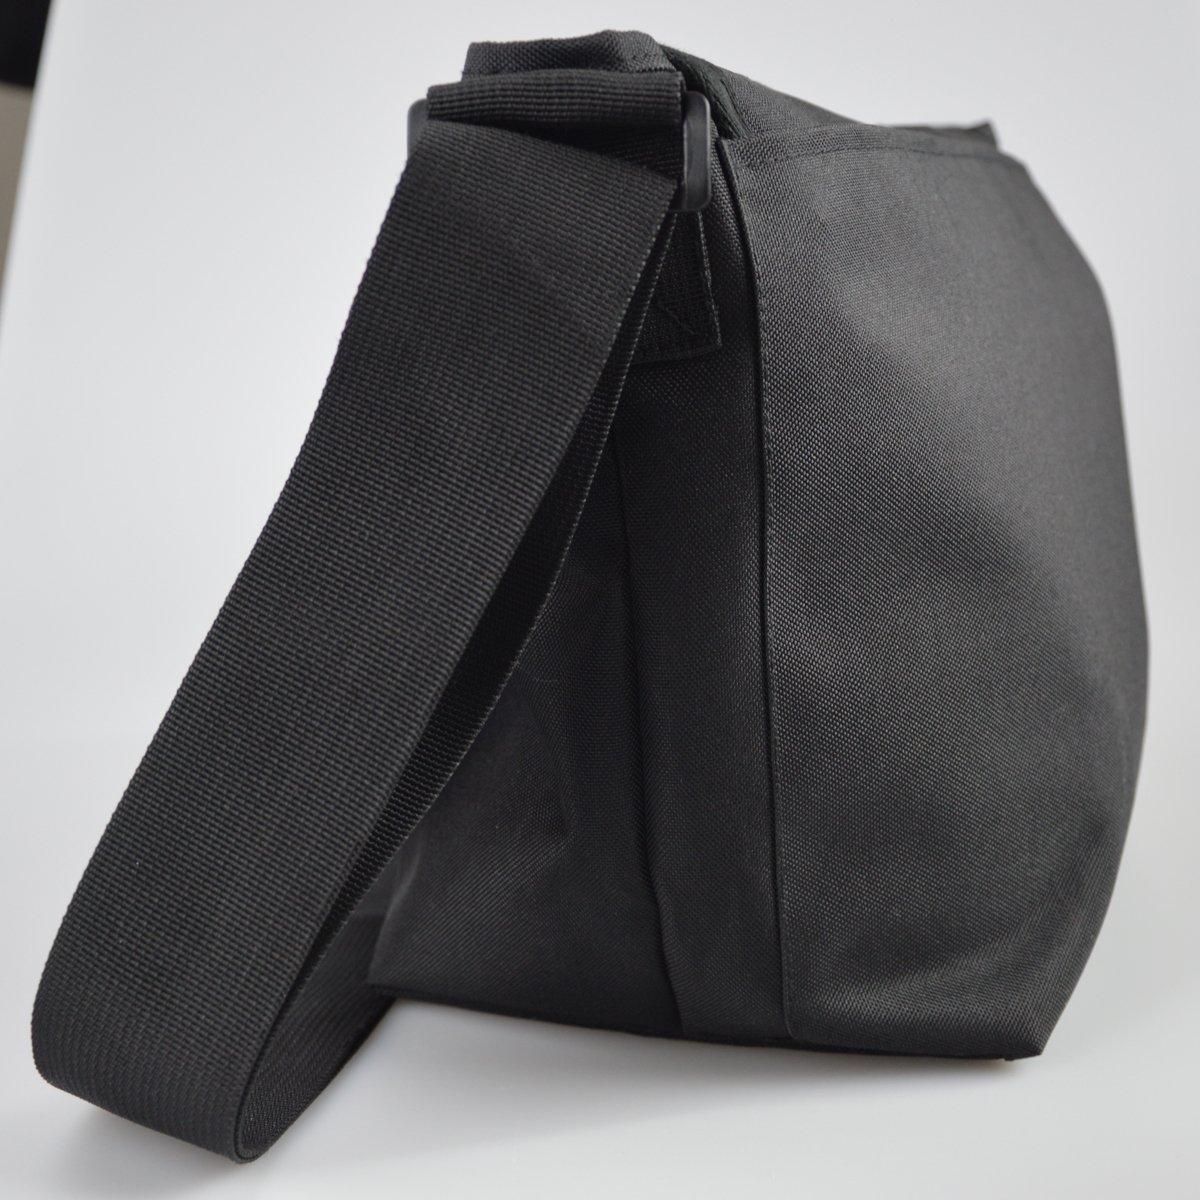 Lov6eoorheeb Unisex Coat Of Arms Of Czech Republic Wide Diagonal Shoulder Bag Adjustable Shoulder Tote Bag Single Shoulder Backpack For Work,School,Daily by Lov6eoorheeb (Image #3)